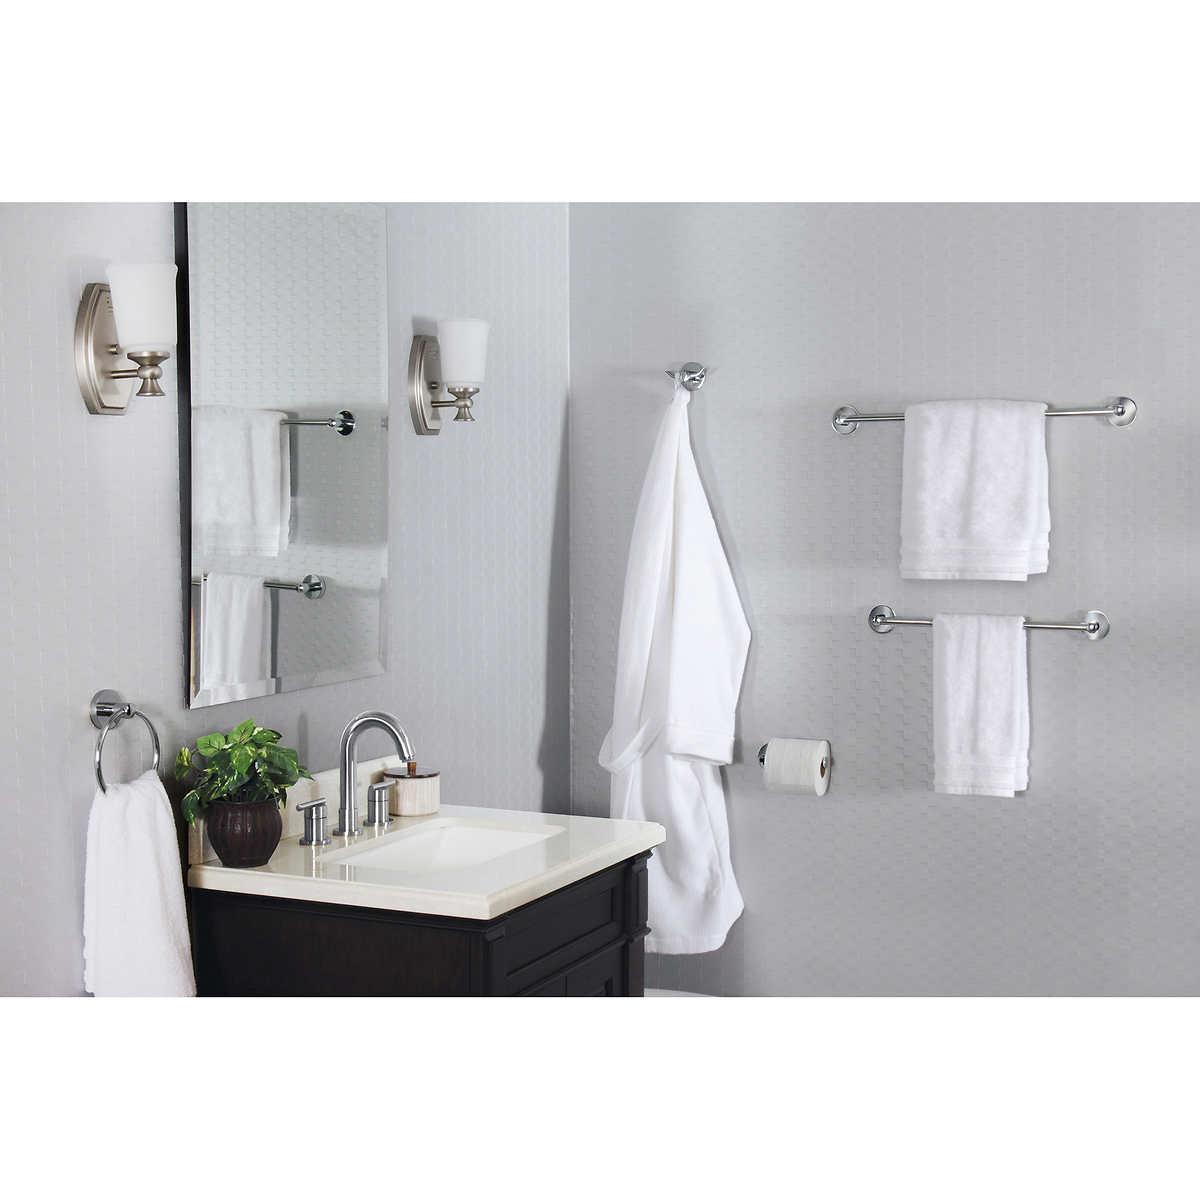 Bathroom Accessories Images - Mercer 5 piece bath set by sheffield